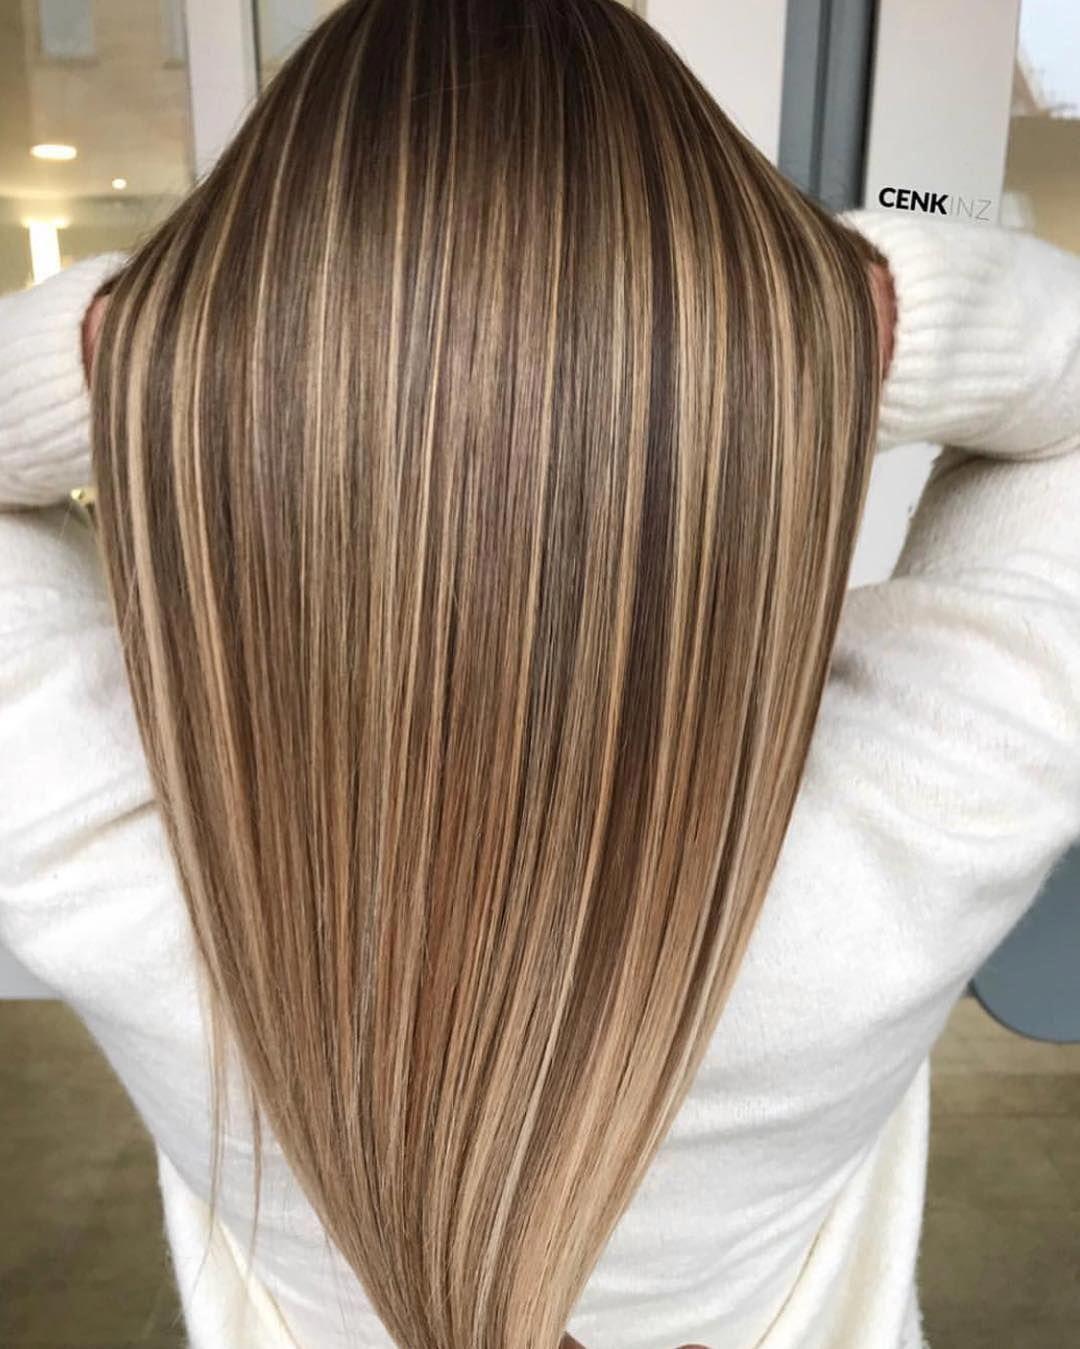 Medium Straight Balayage Hair Mediumstraightbalayagehair Brown Blonde Hair Long Straight Hair Blonde Hair Color